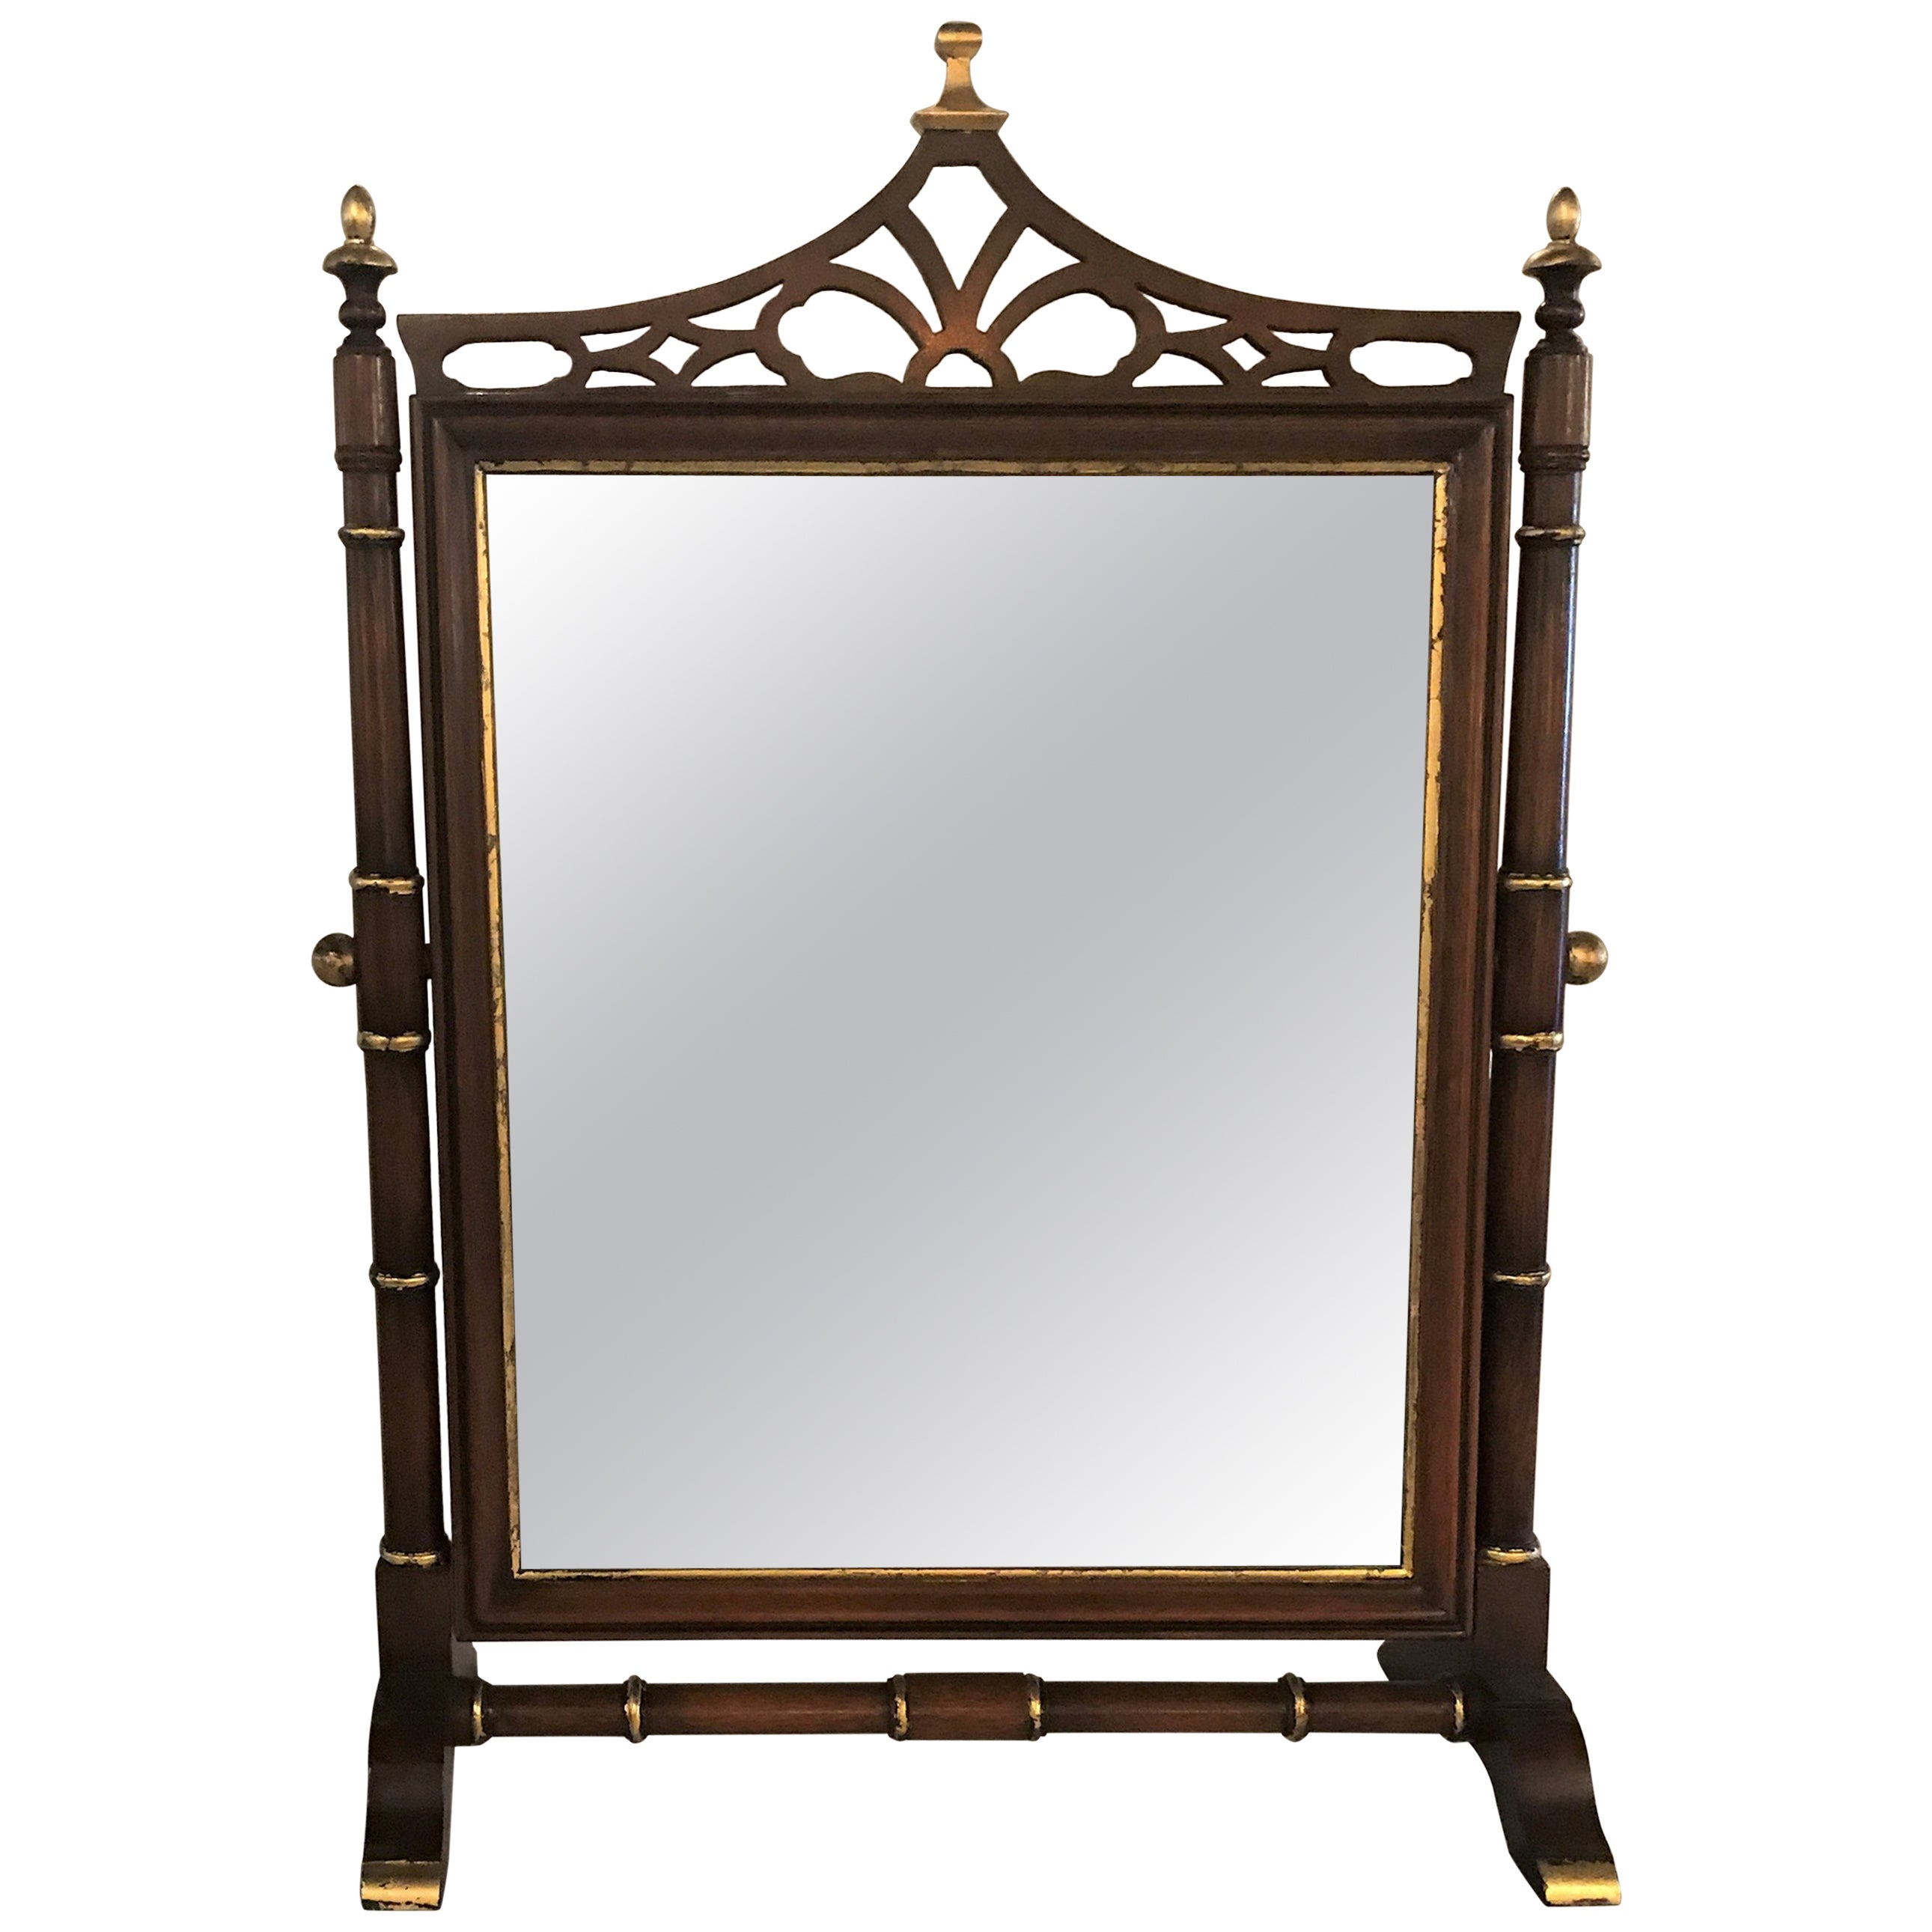 Tilting Federal Style Shaving Mirror Mahogany